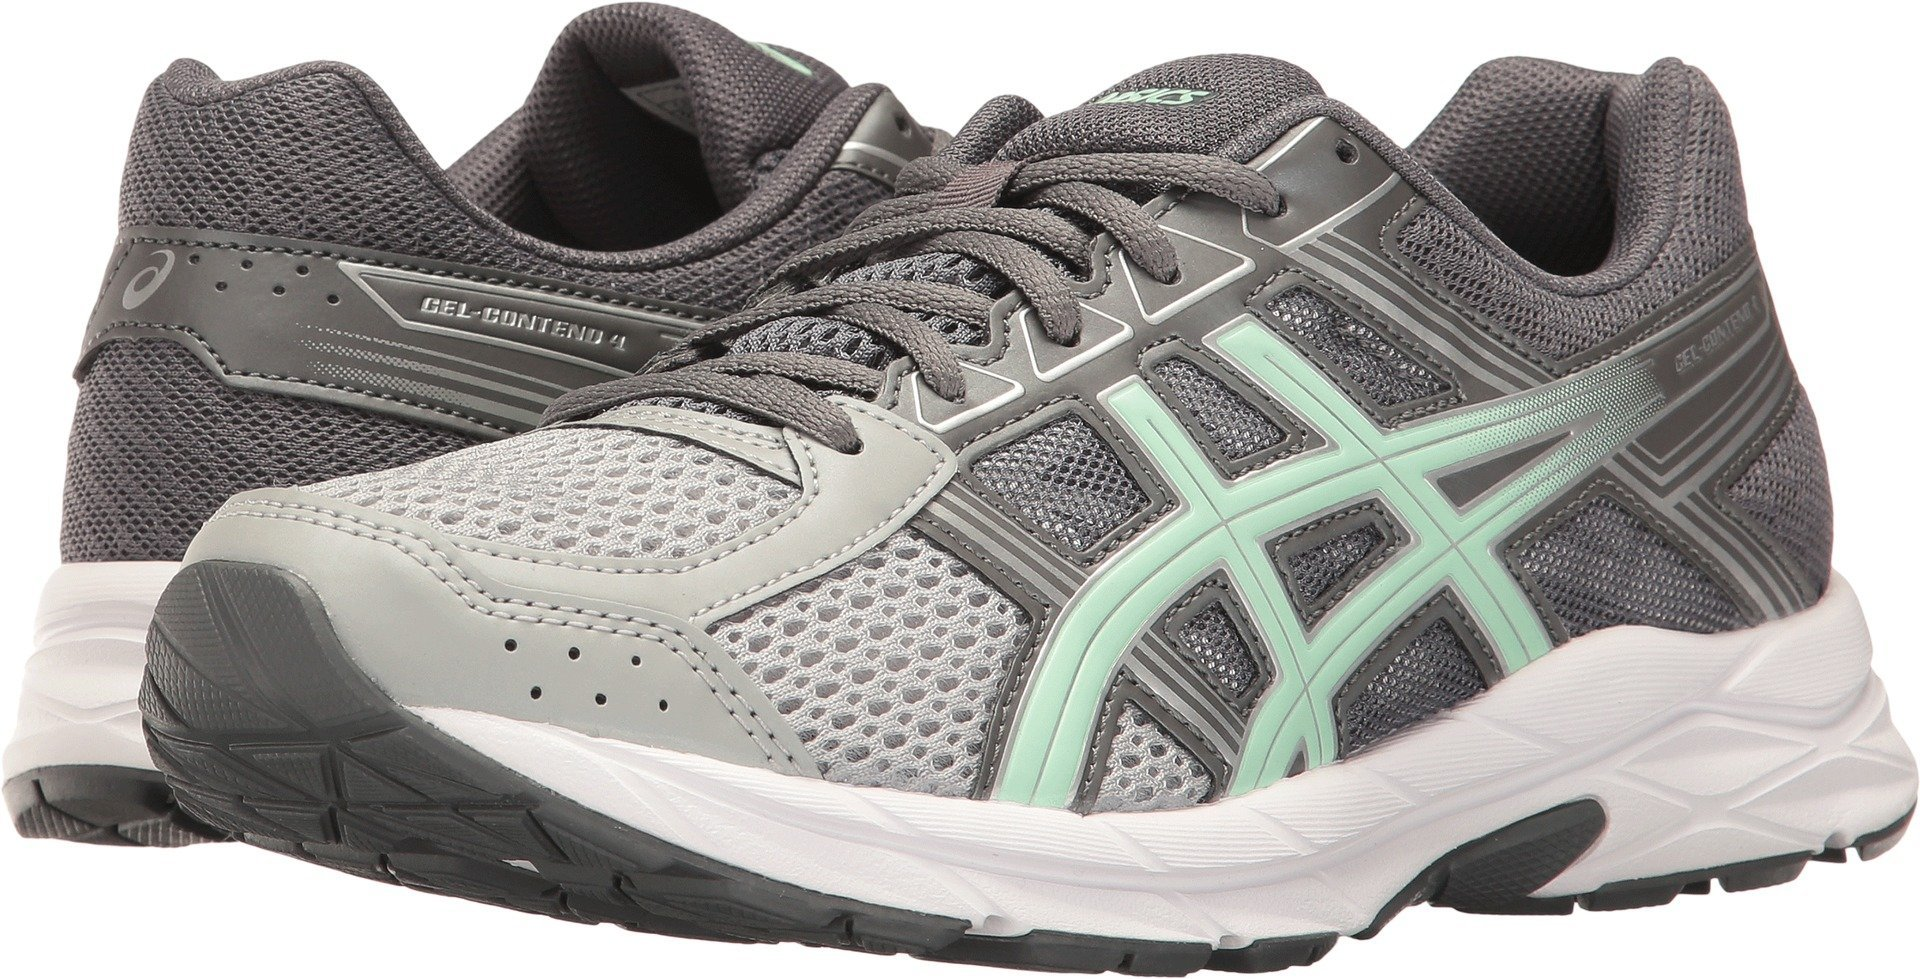 ASICS Gel-Contend 4 Women's Running Shoe, Mid Grey/Glacier Sea/Silver, 5 W US